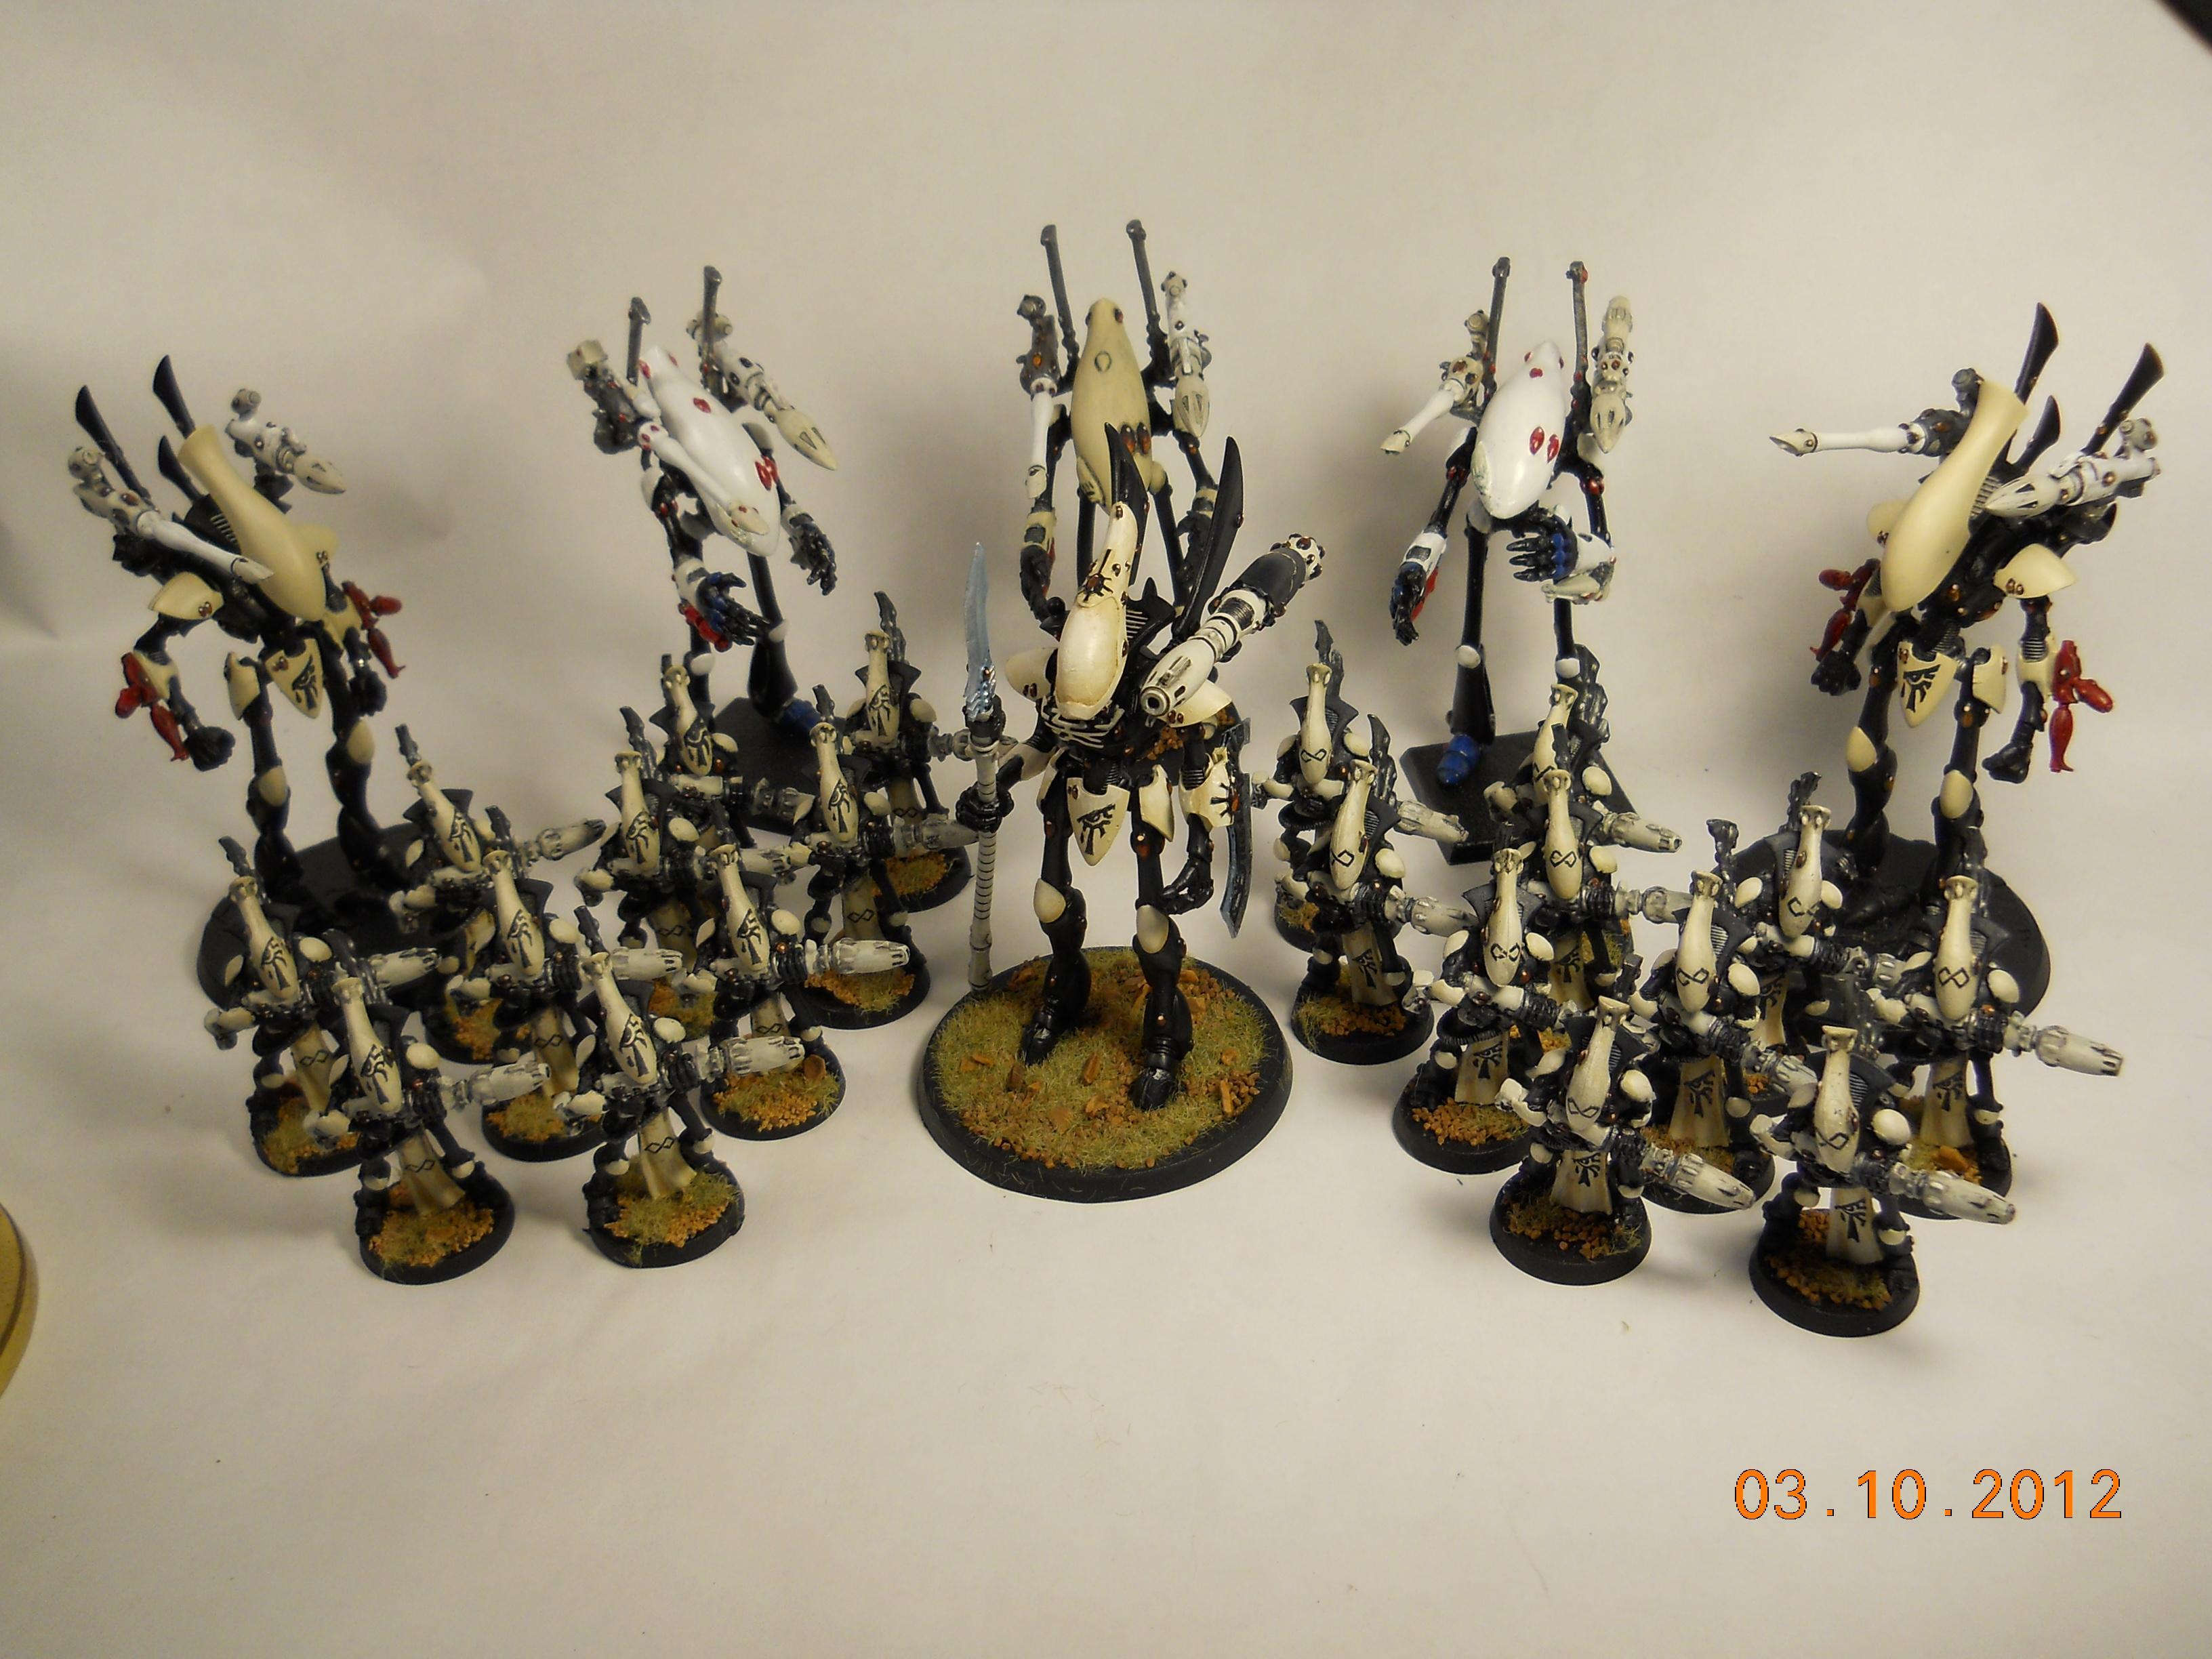 Eldar, Ulthwe, Wraithguard, Wraithlord, Wraithseer